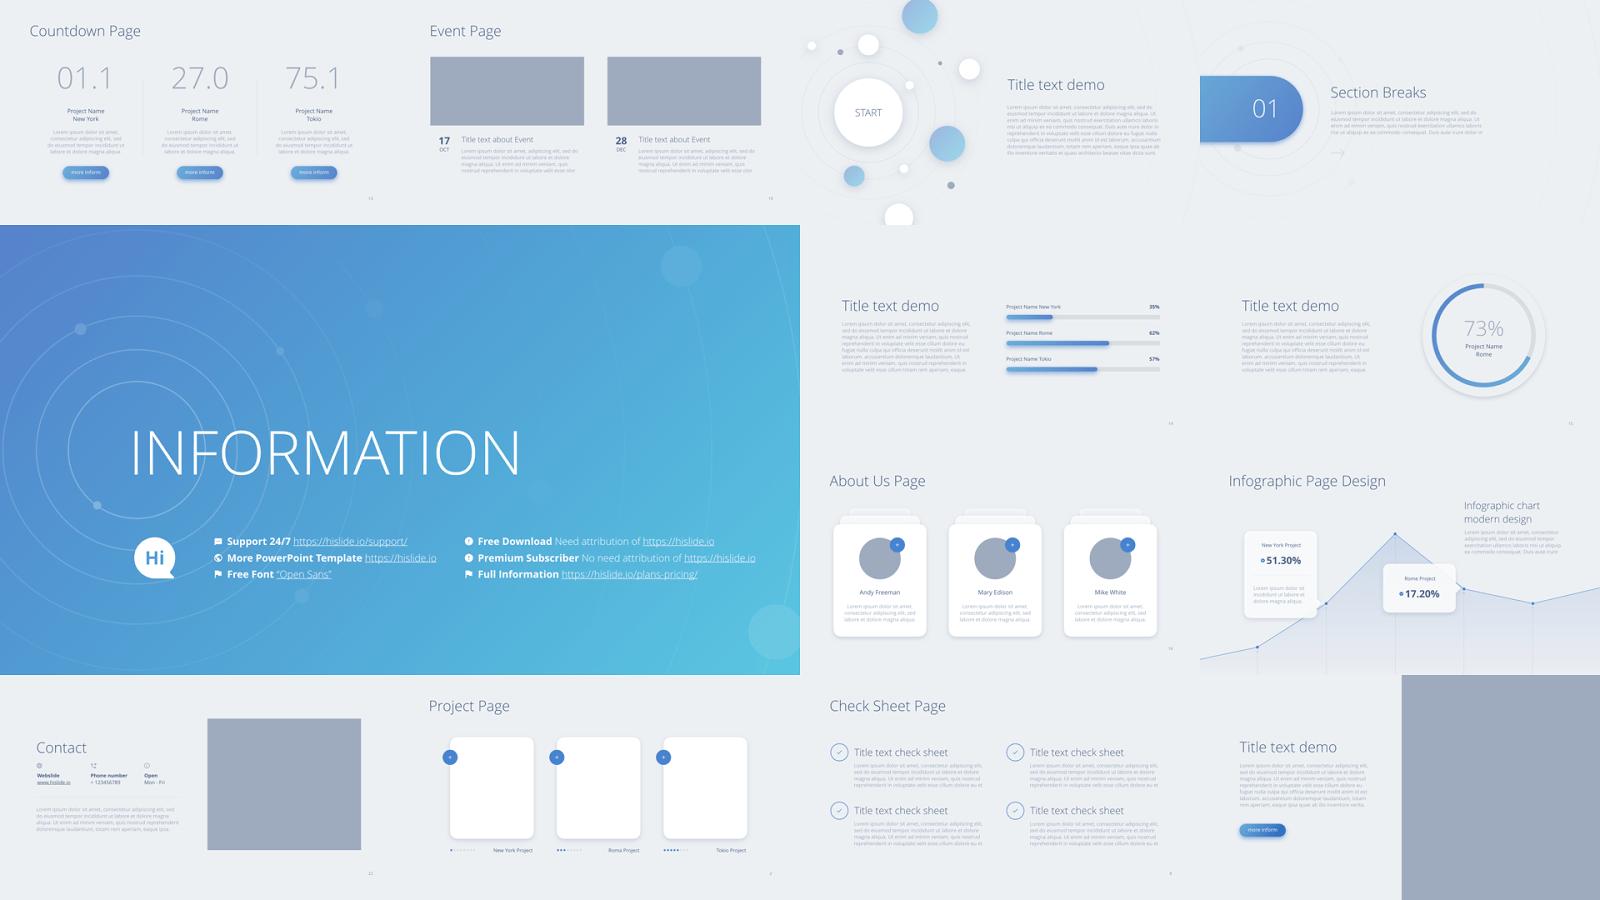 Templates 免費 PowerPoint 簡報範本下載。讓你的報告呈現最佳效果 — BFA 簡報